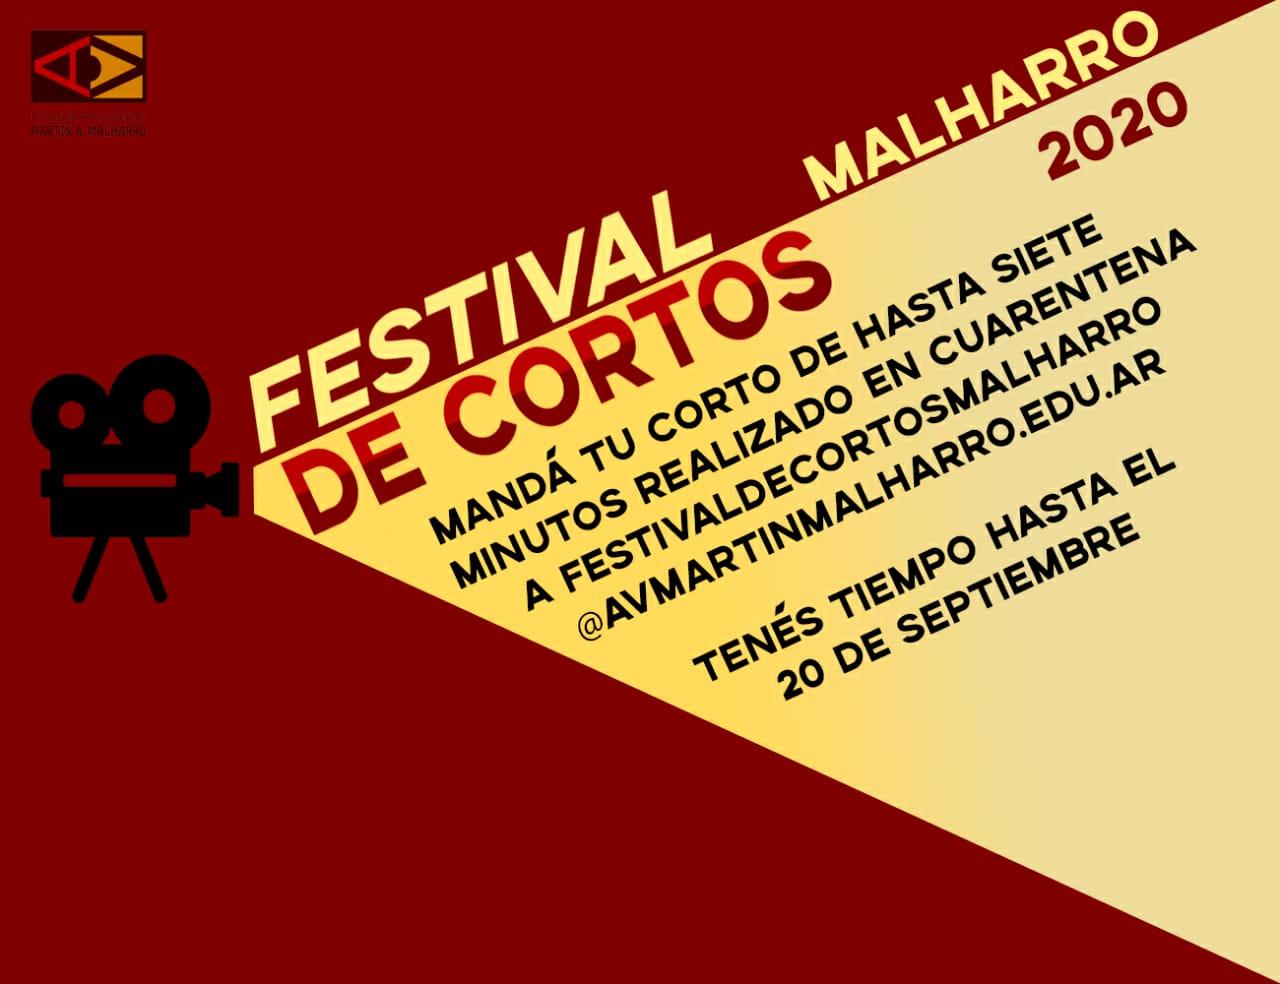 Convocatoria al Festival de cortos Malharro 2020